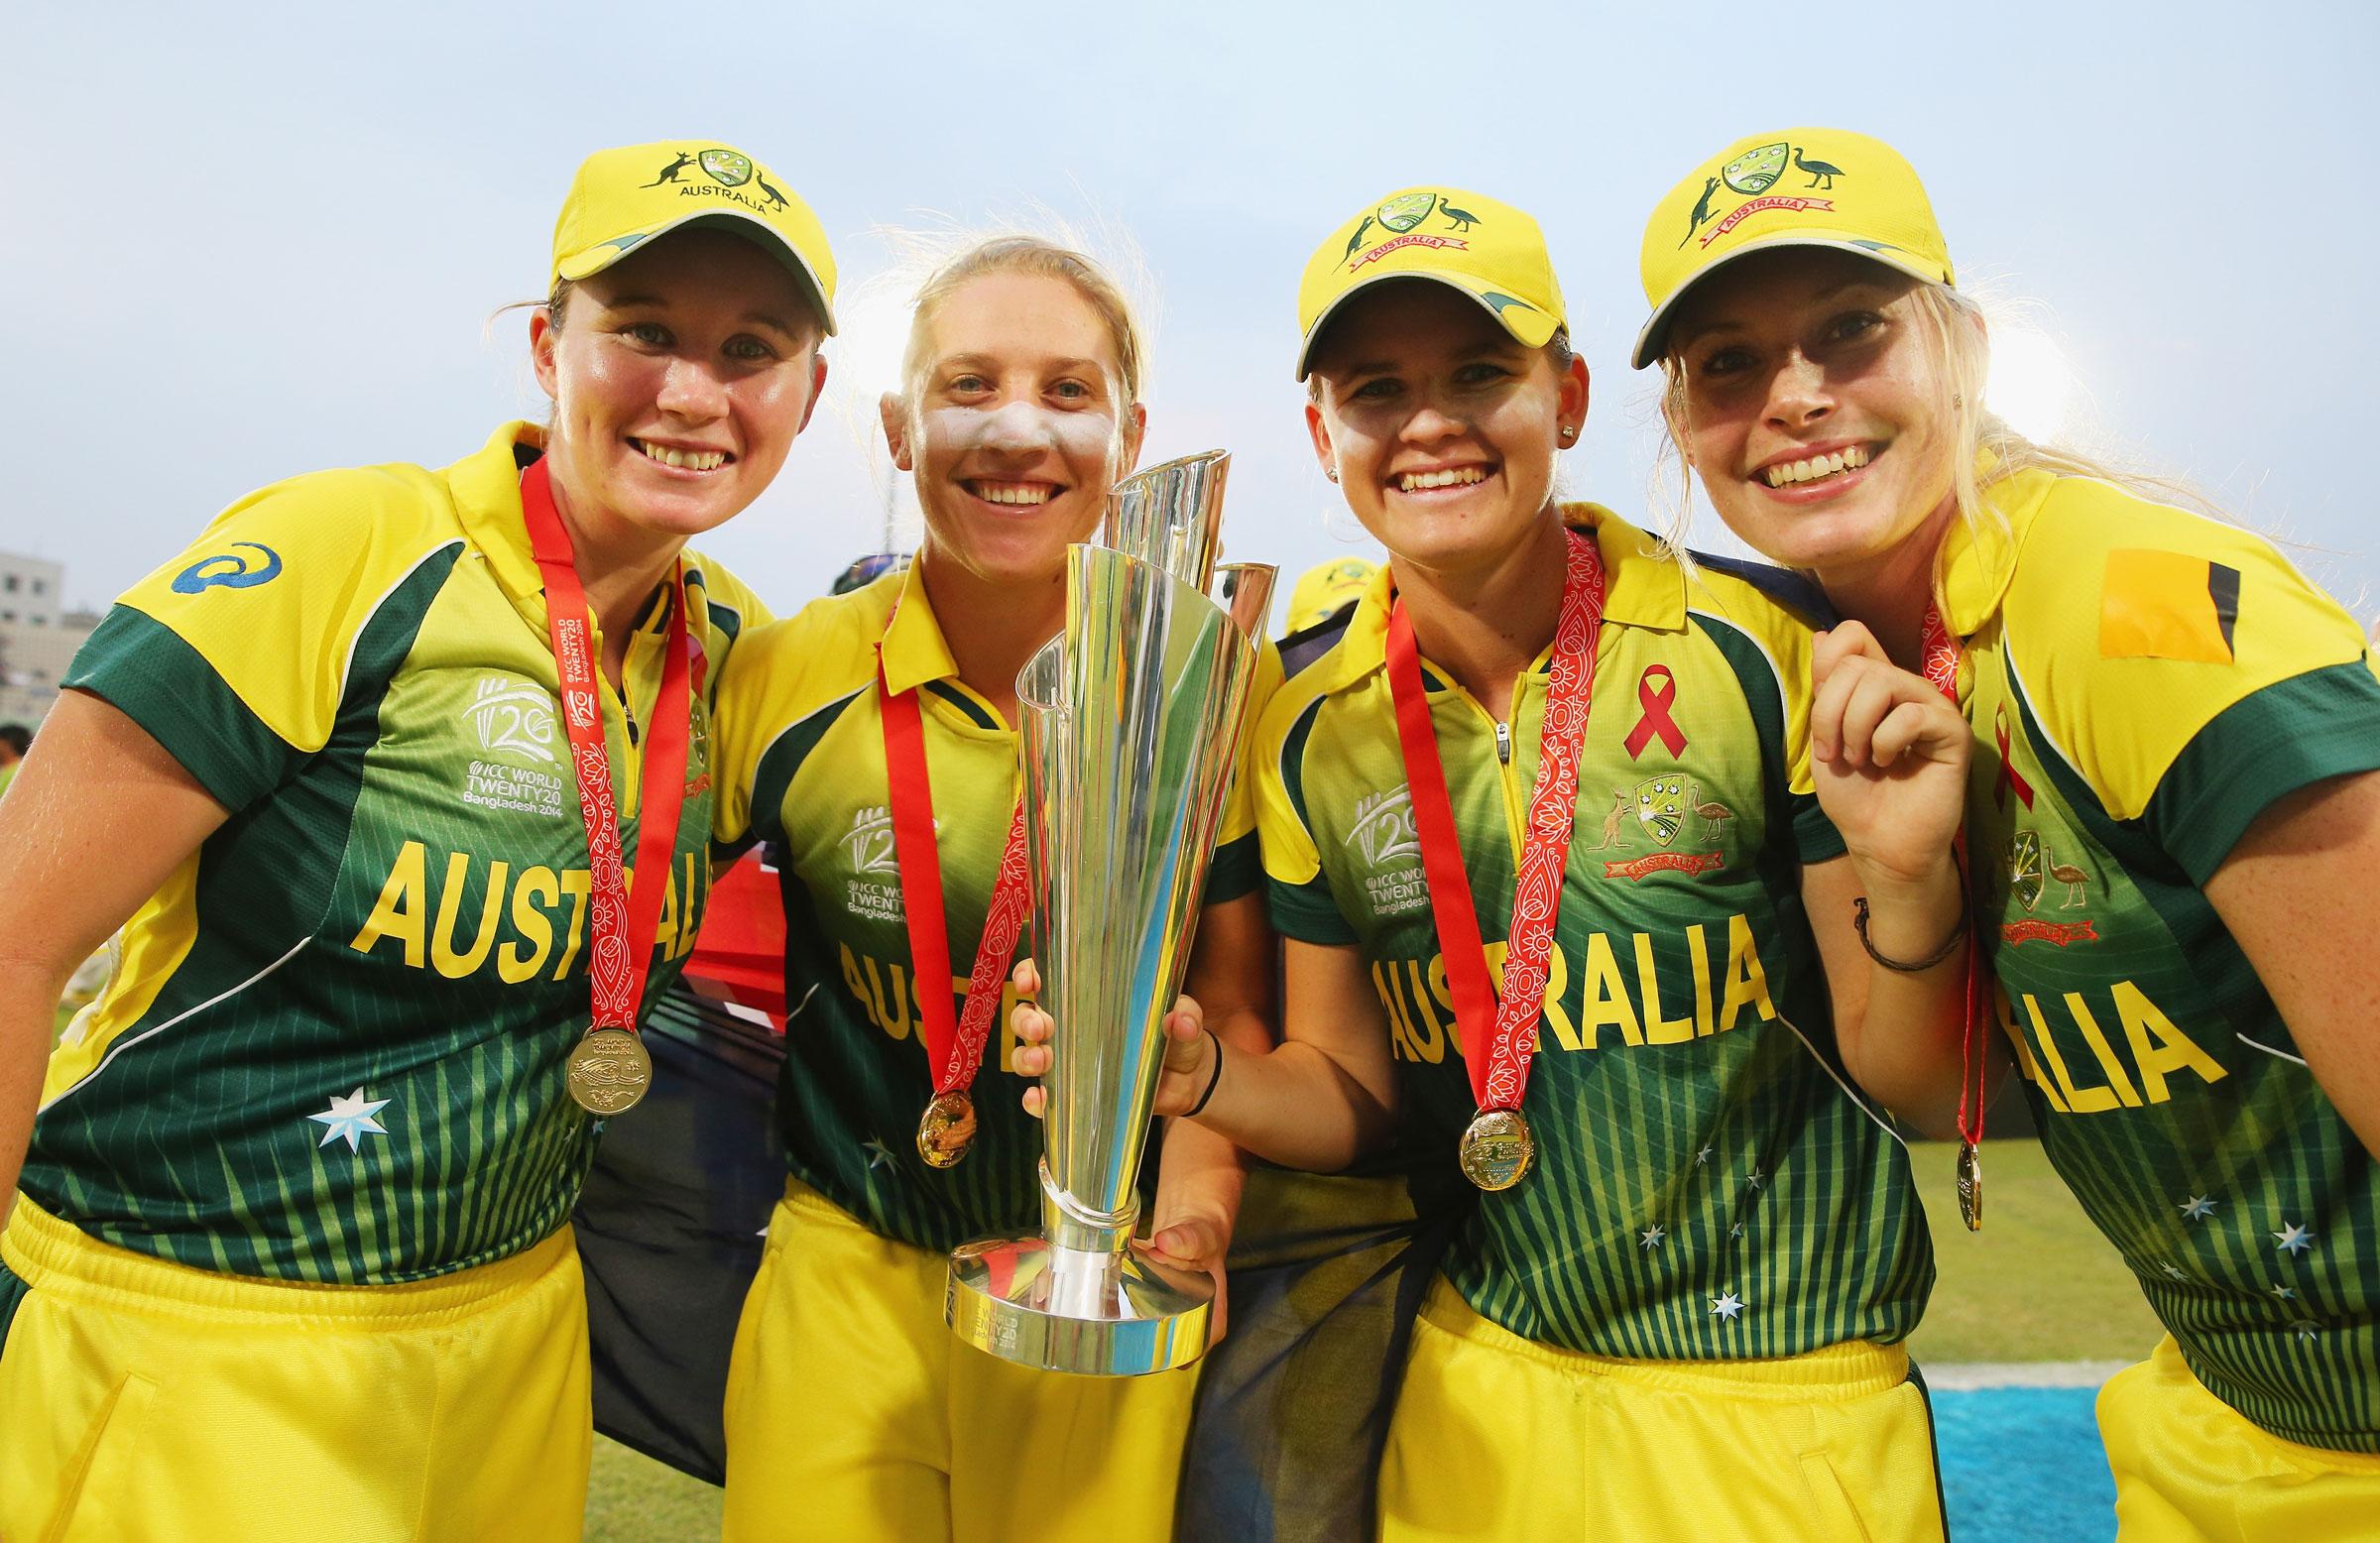 Kimmince was part of Australia's 2014 World T20 win // Getty